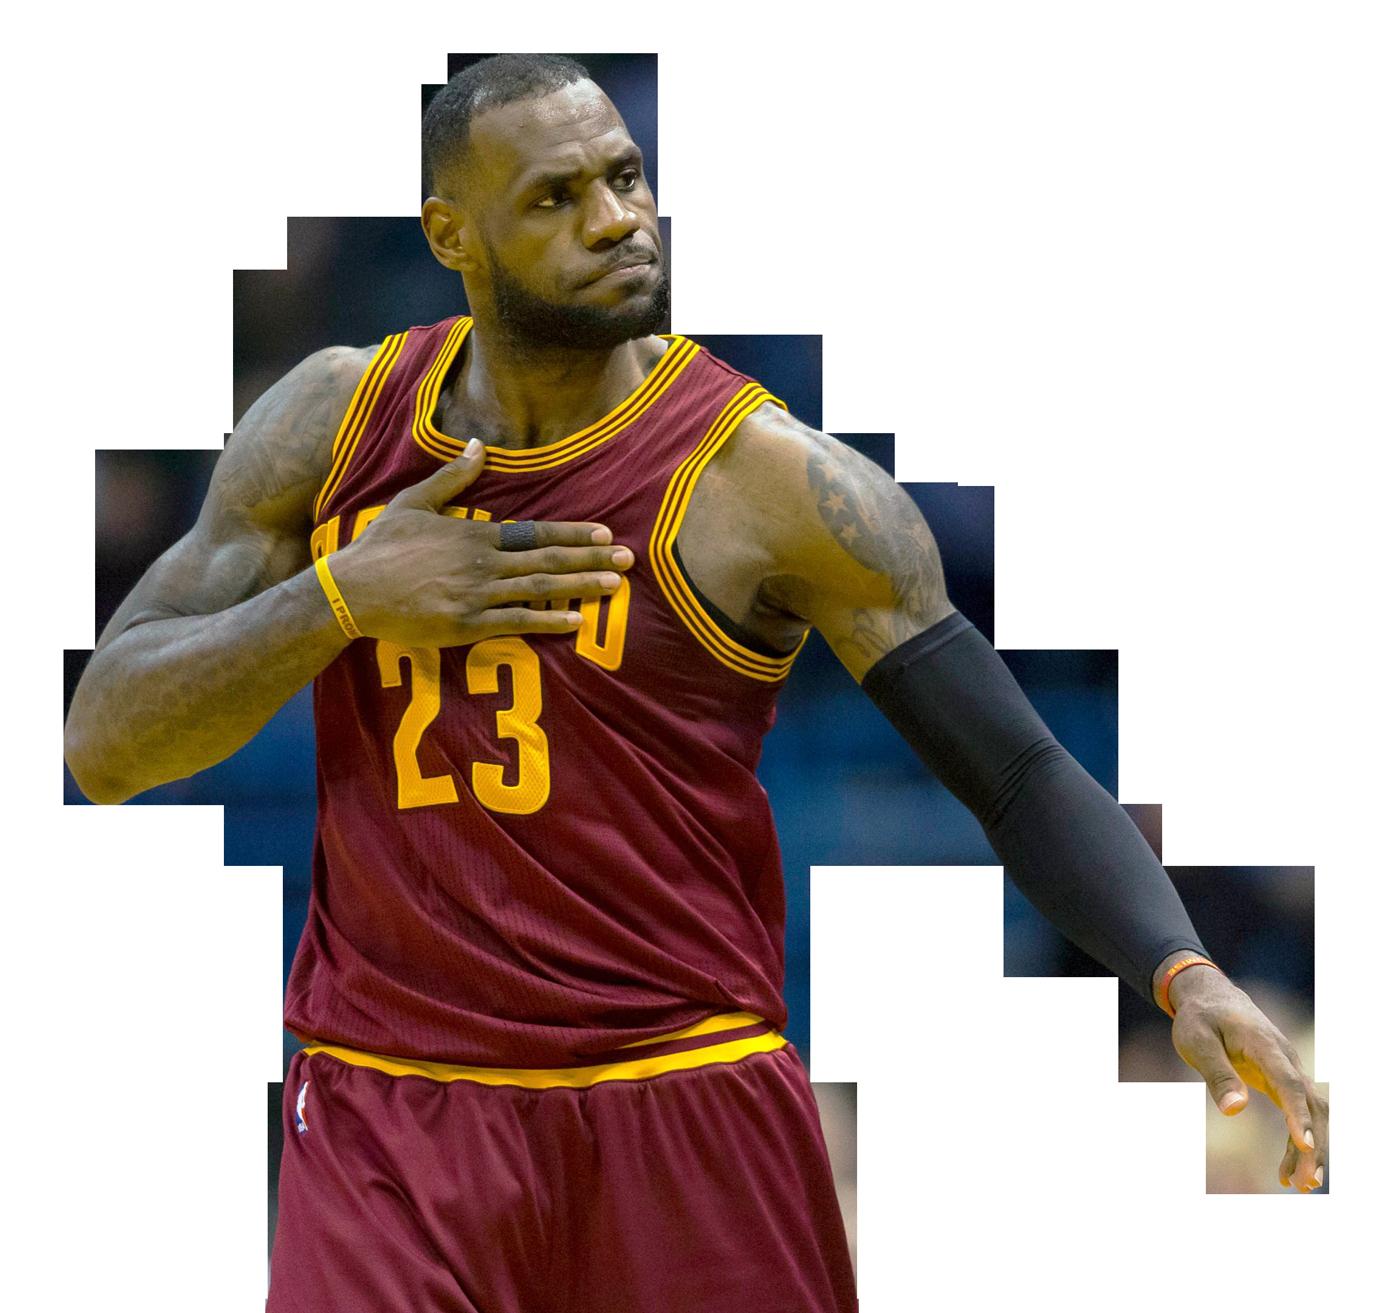 Download Shirt Cavaliers James Finals Cleveland The Lebron Hq Png Image Freepngimg